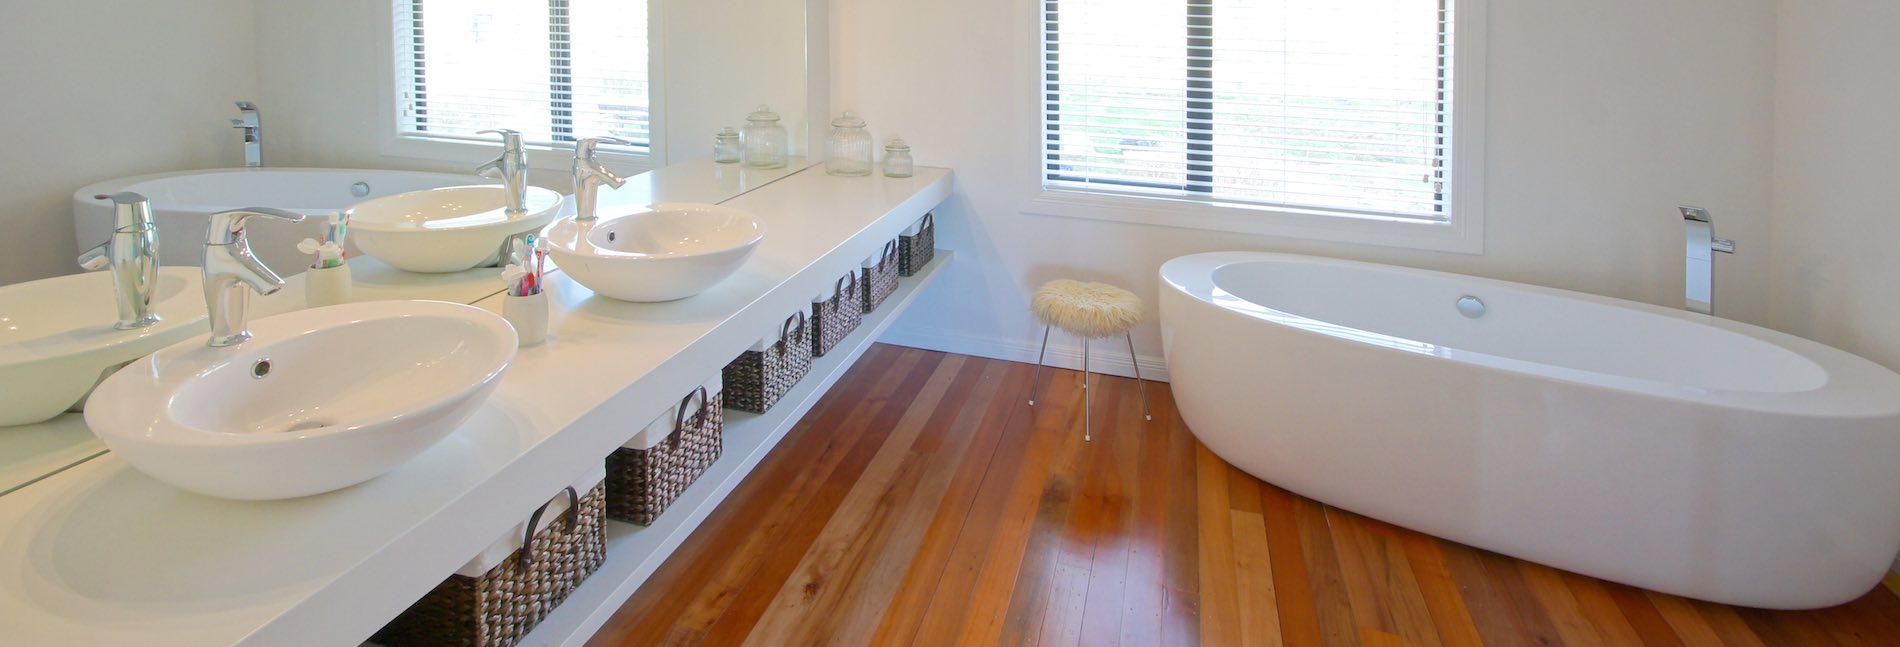 Bathroom Header